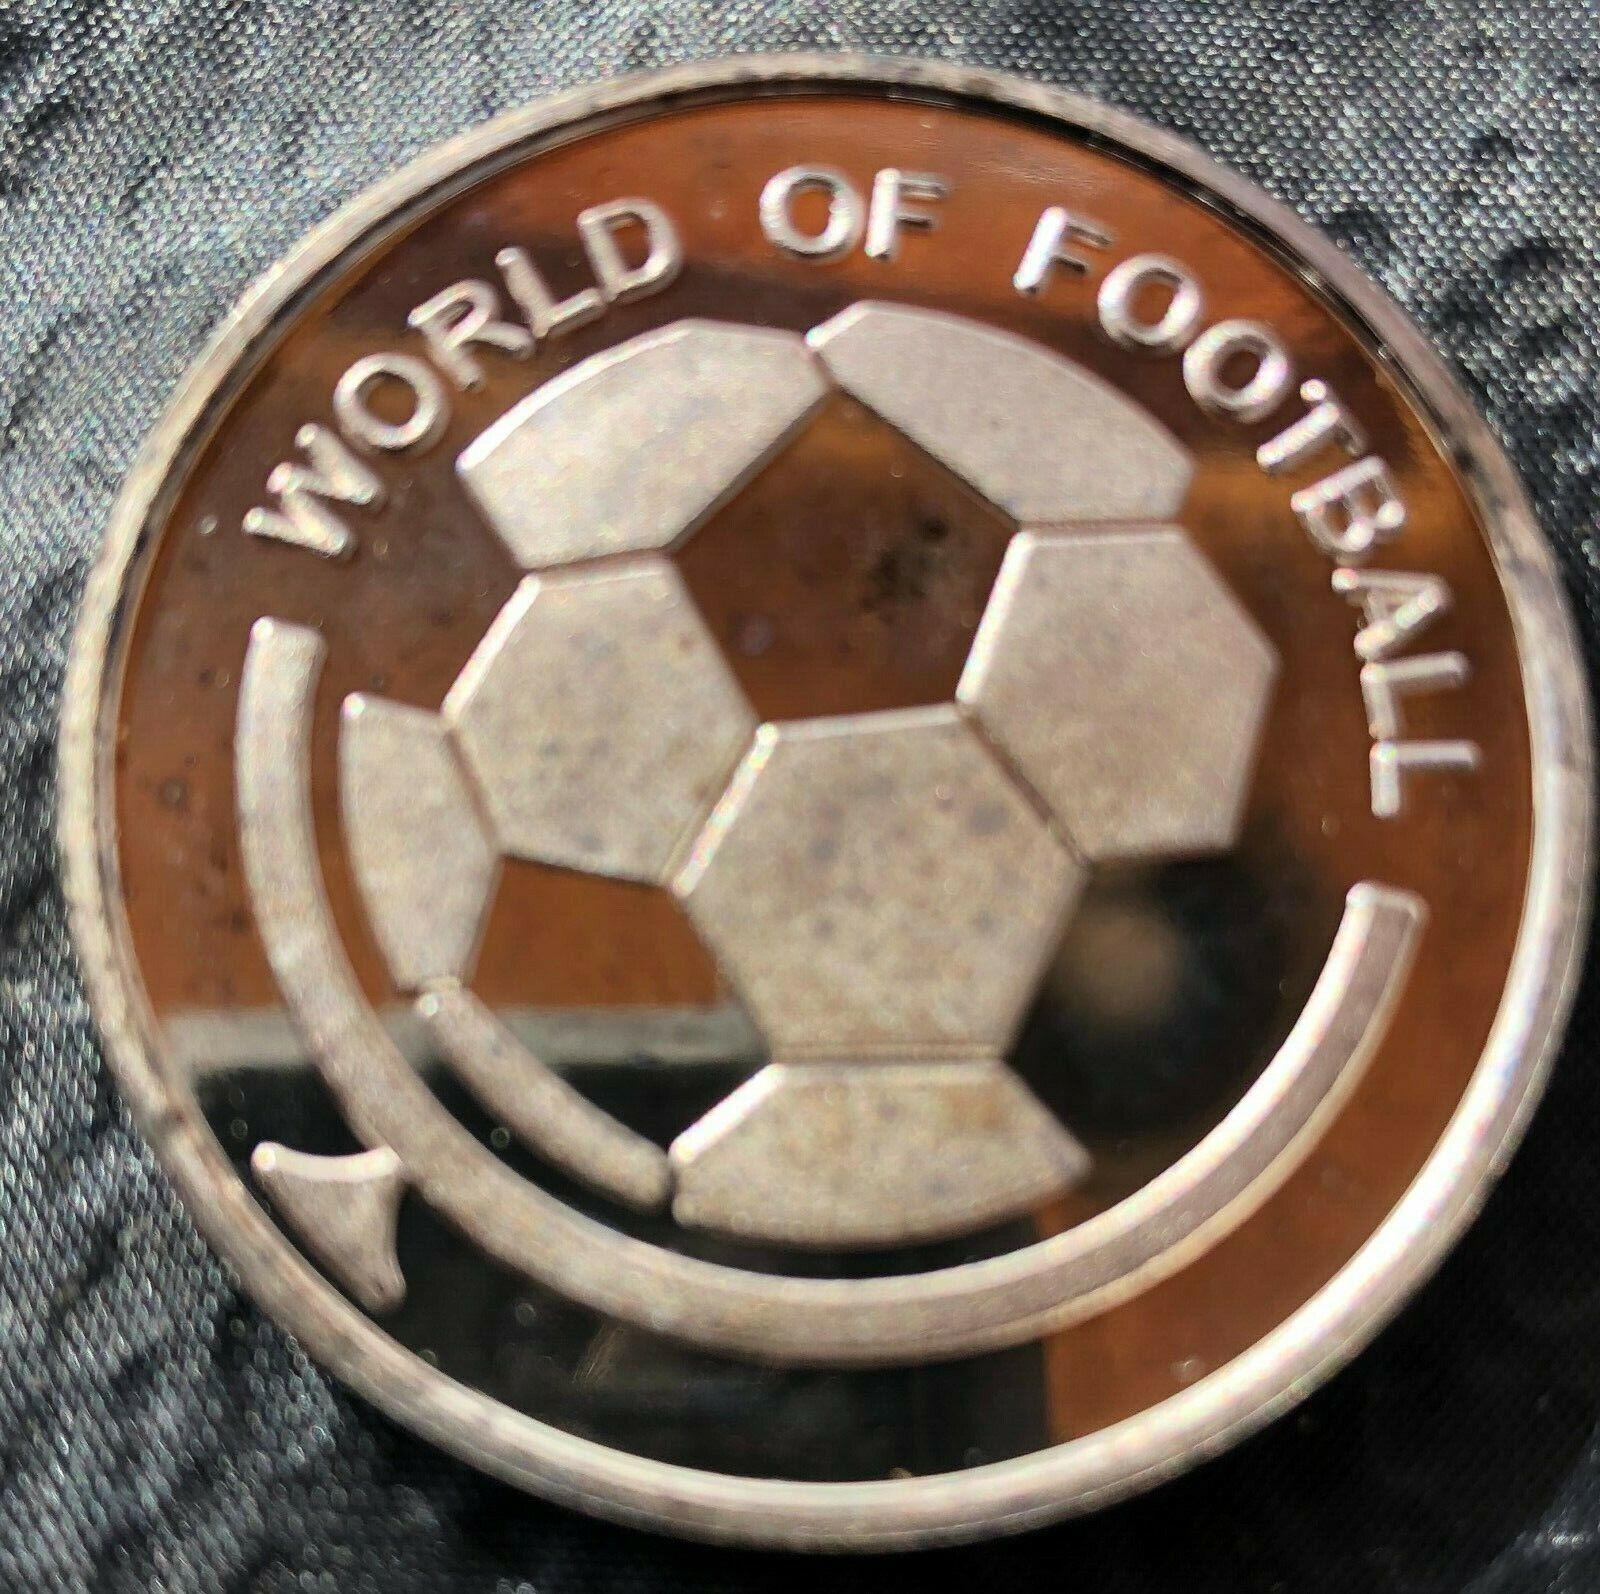 2002 world of football soccer 1000 shillings bank of uganda africa proof coin